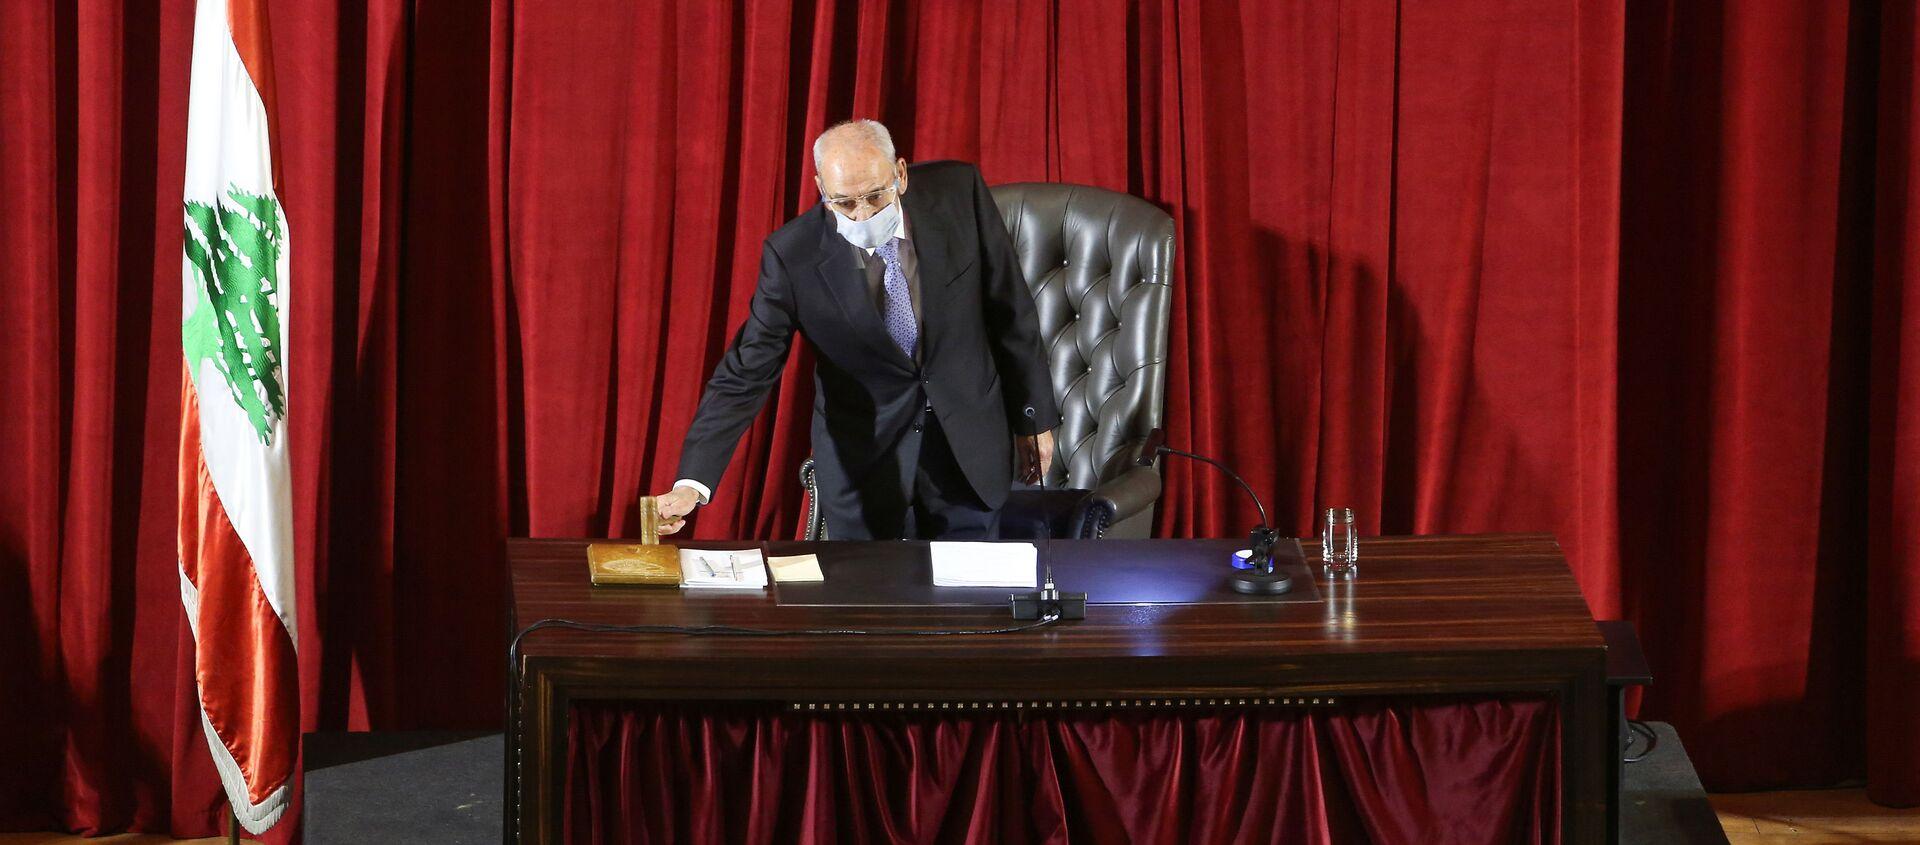 Lebanese Parliament Speaker Nabih Berri heads a legislative session at UNESCO Palace in Beirut, Lebanon March 12, 2021. - Sputnik International, 1920, 30.03.2021